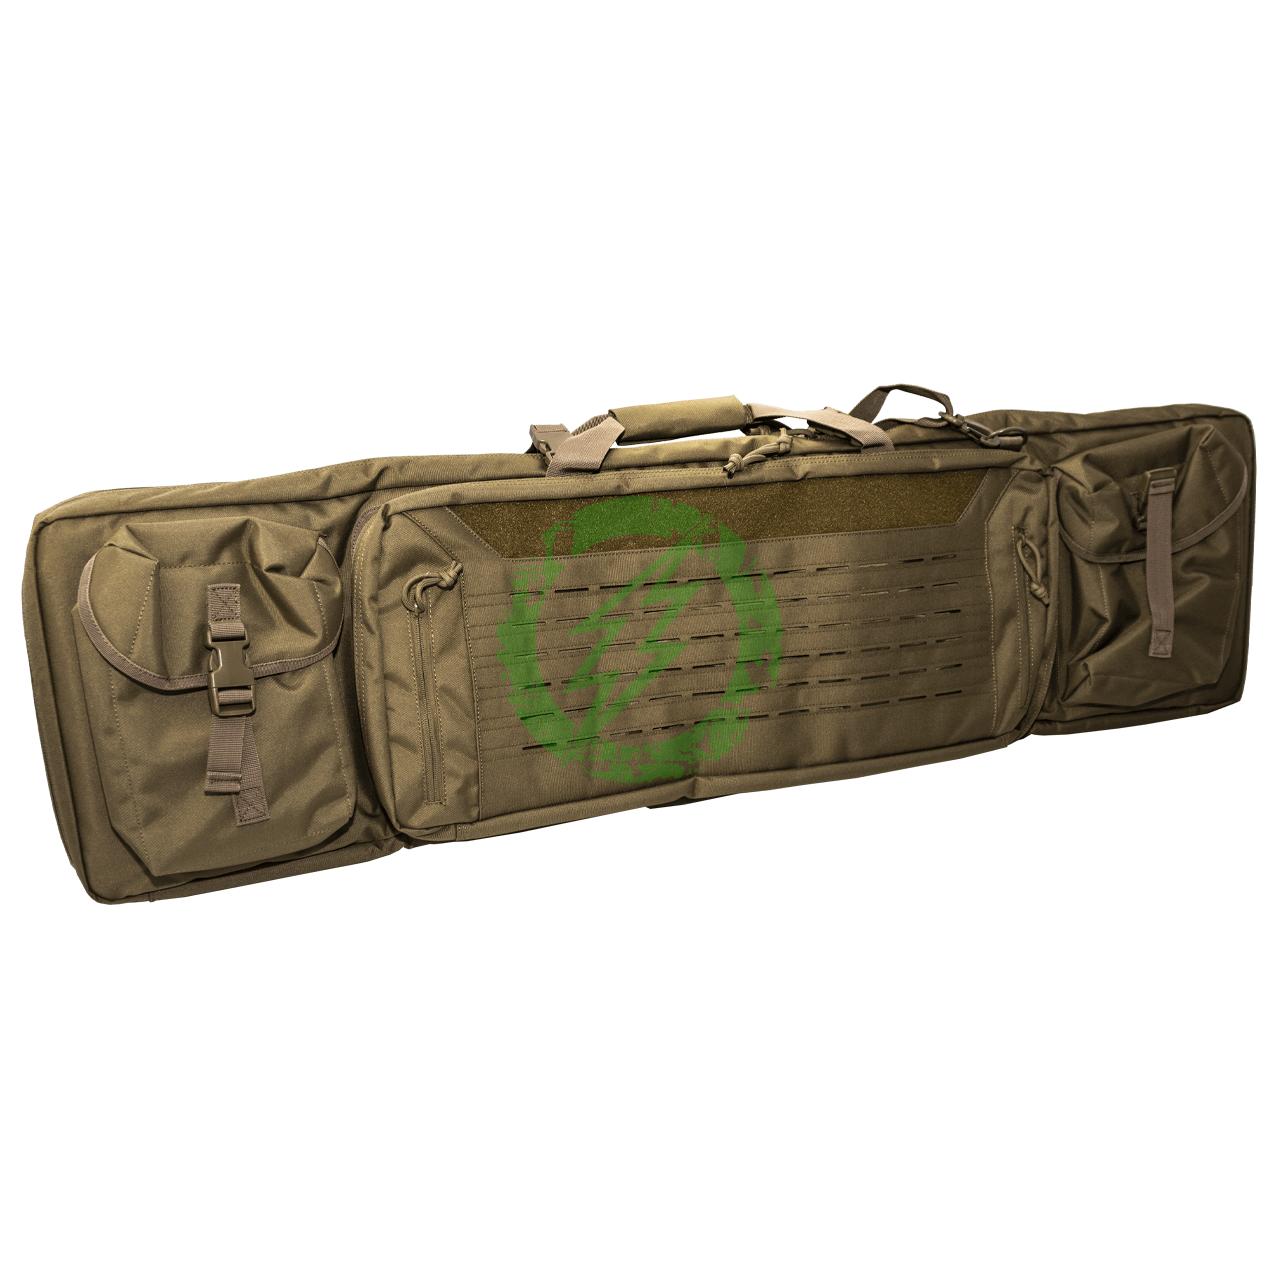 "Guawin Laser Cut 46"" Rifle Bag | Tan"